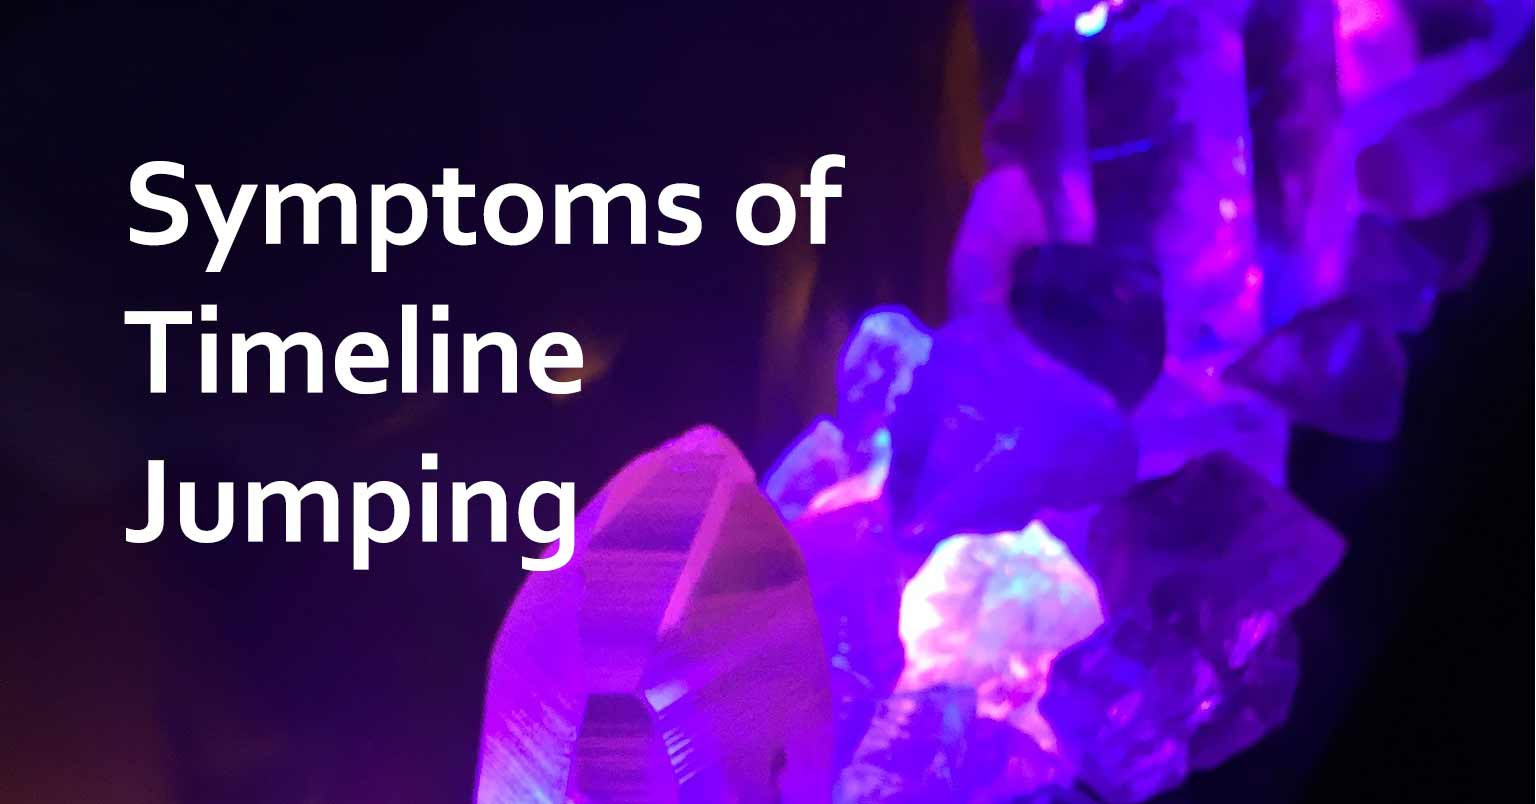 Symptoms of Timeline Jumping - Oh boy it's timeline bazaar